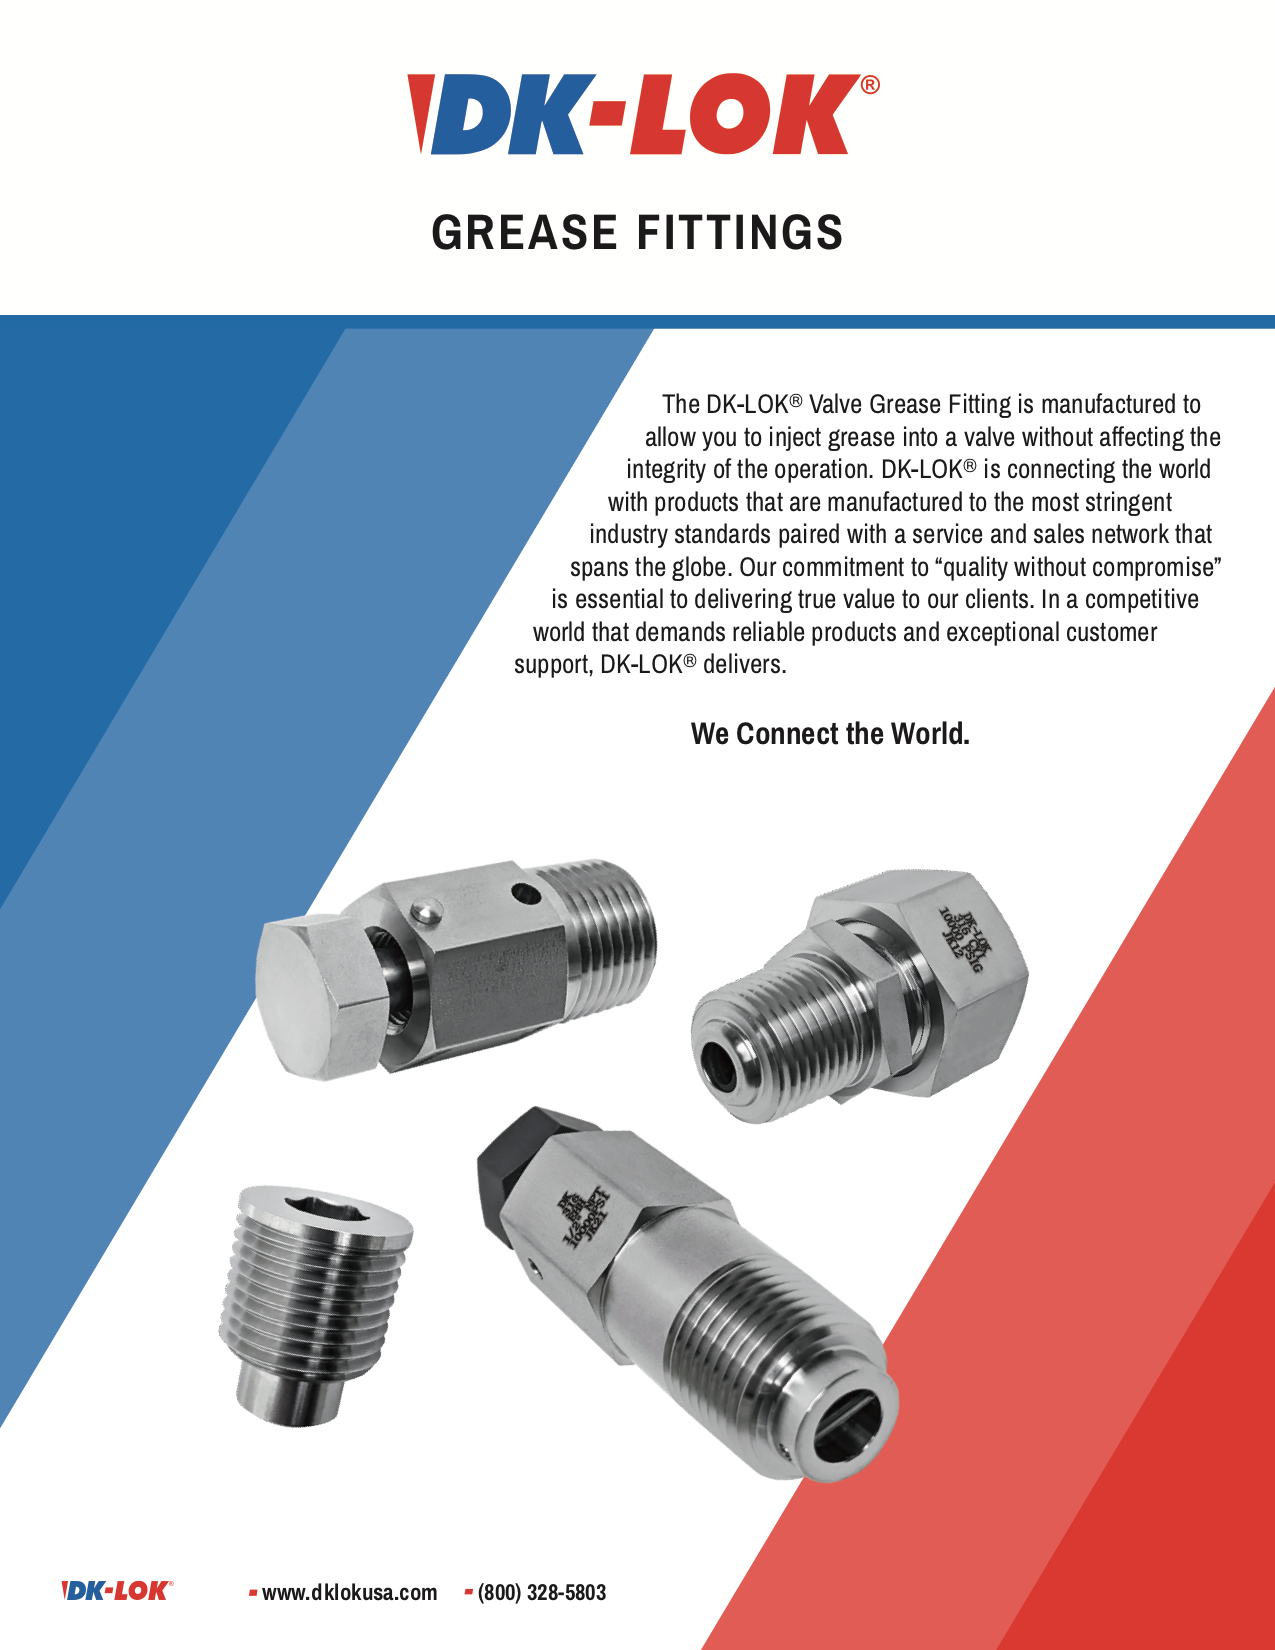 DK-LOK Grease Fittings Catalog Image